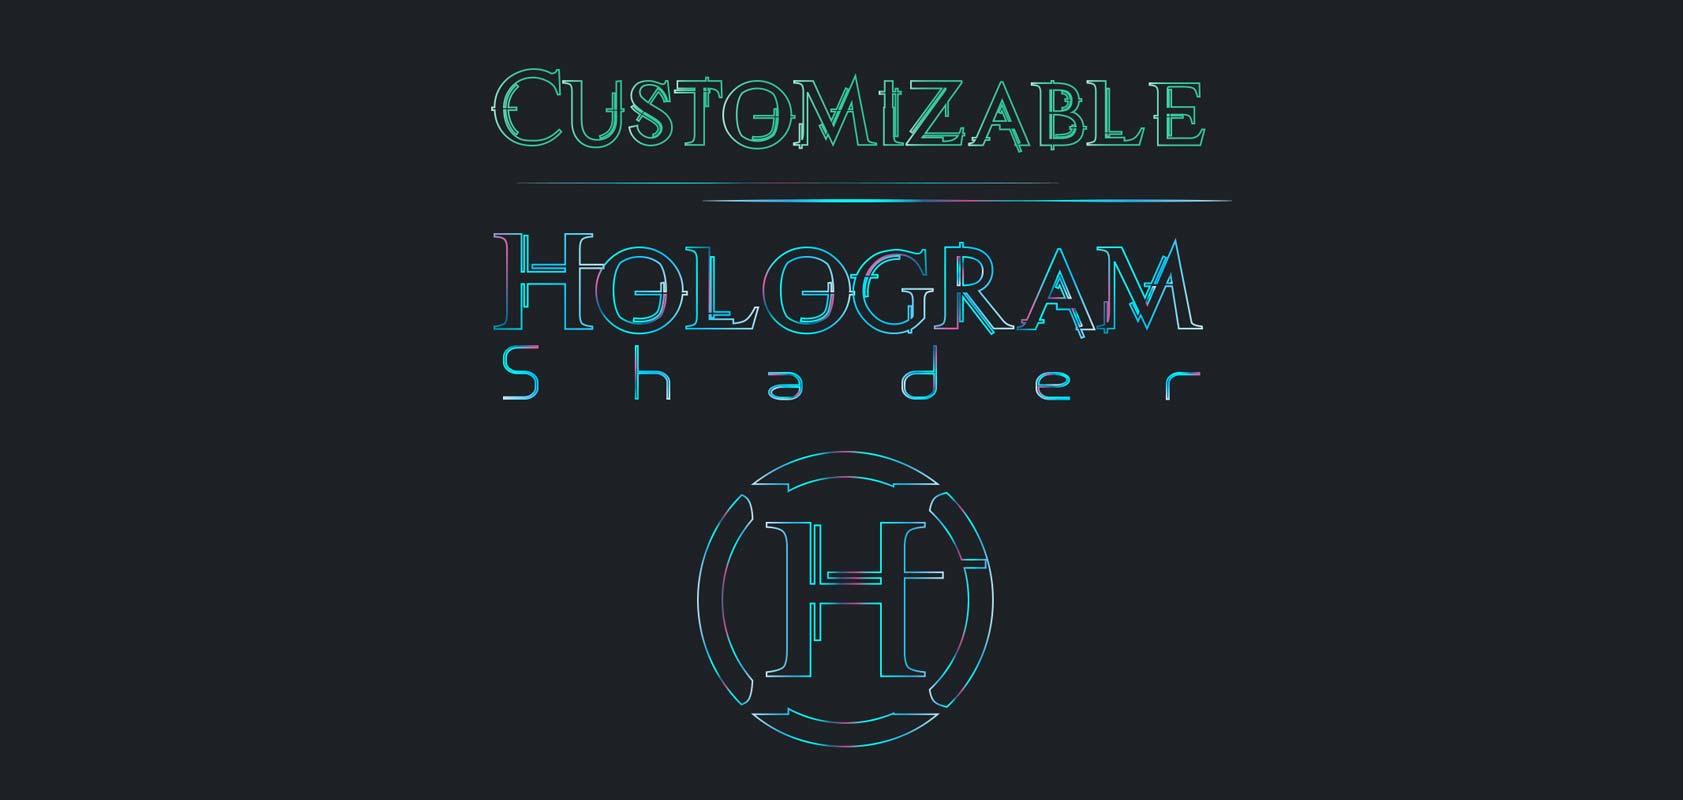 RELEASED] Customizable Hologram Shader - Unity Forum